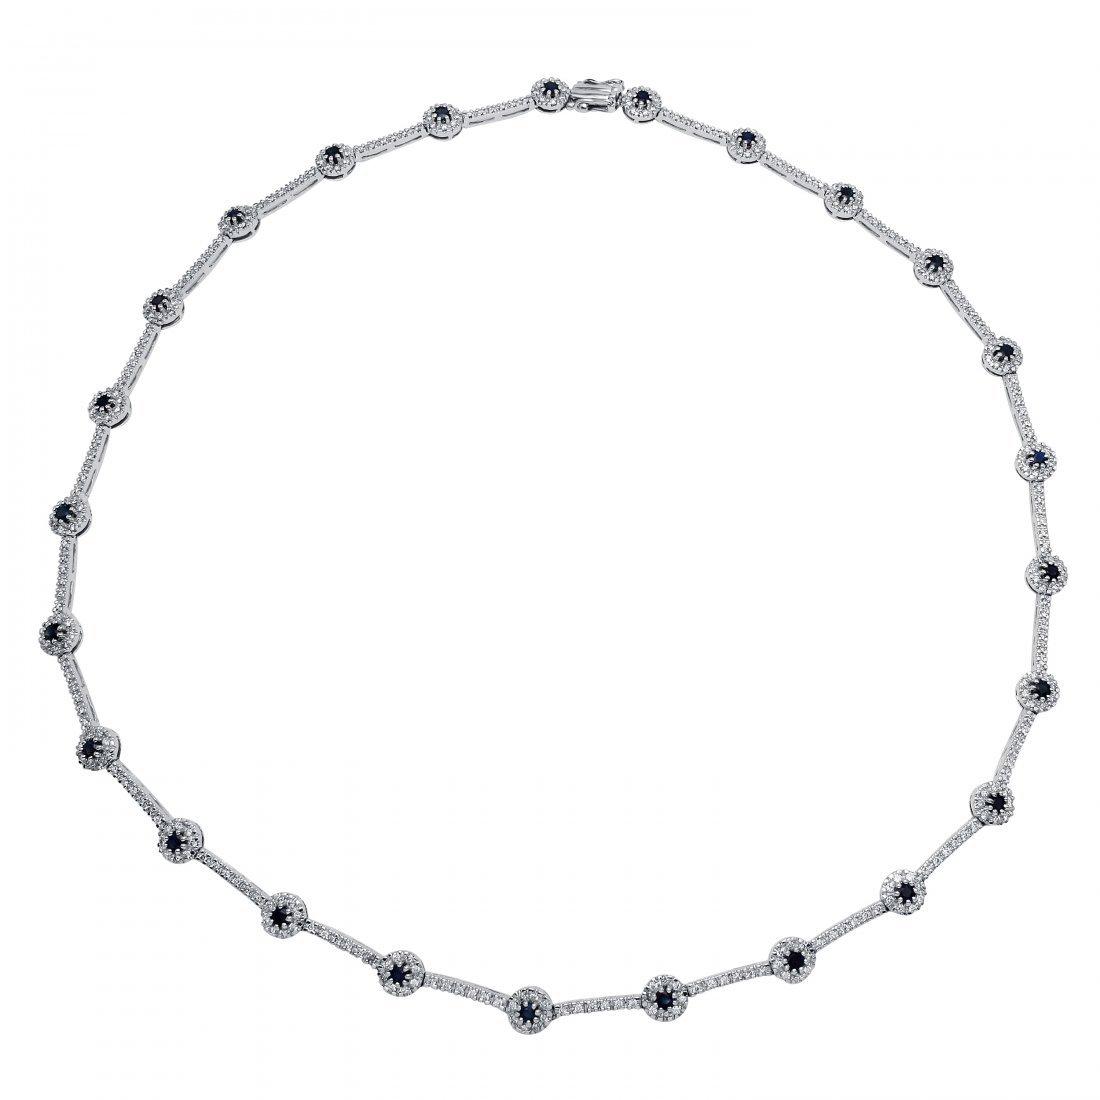 5.15 CTW 14K White Gold Ladies Necklace